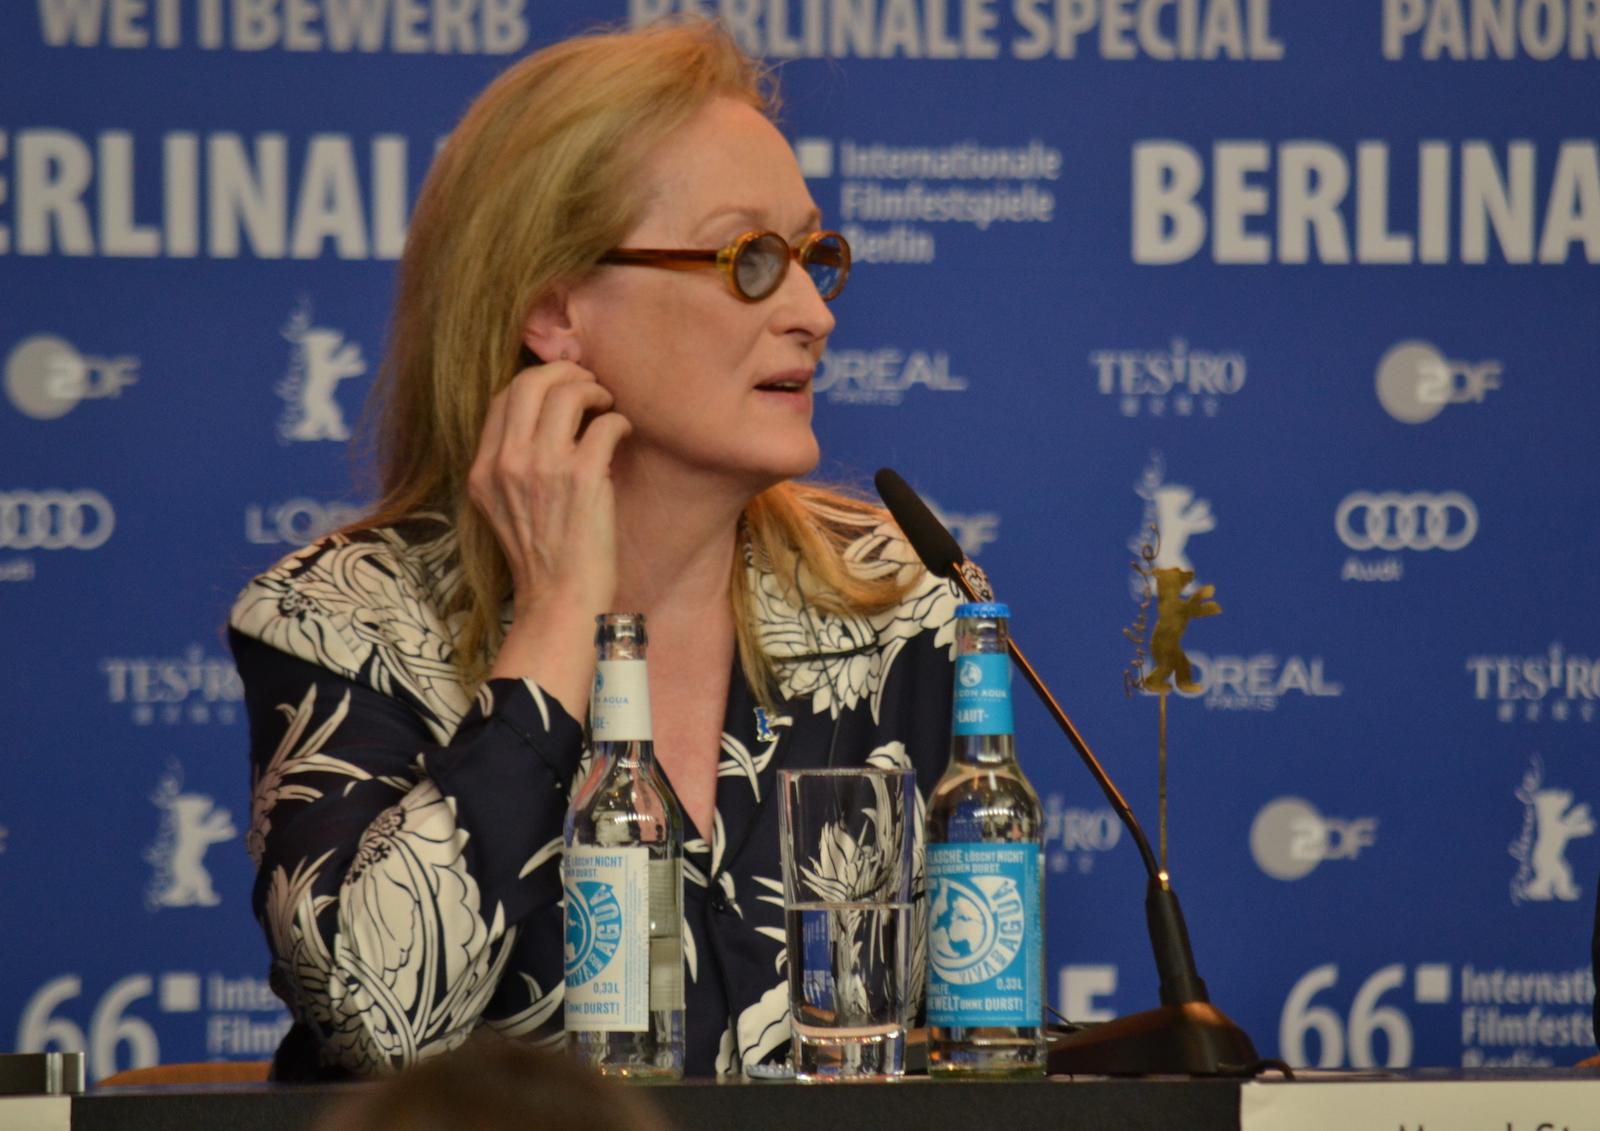 Berlino 2016: Meryl Streep, presidente della giuria, in conferenza stampa